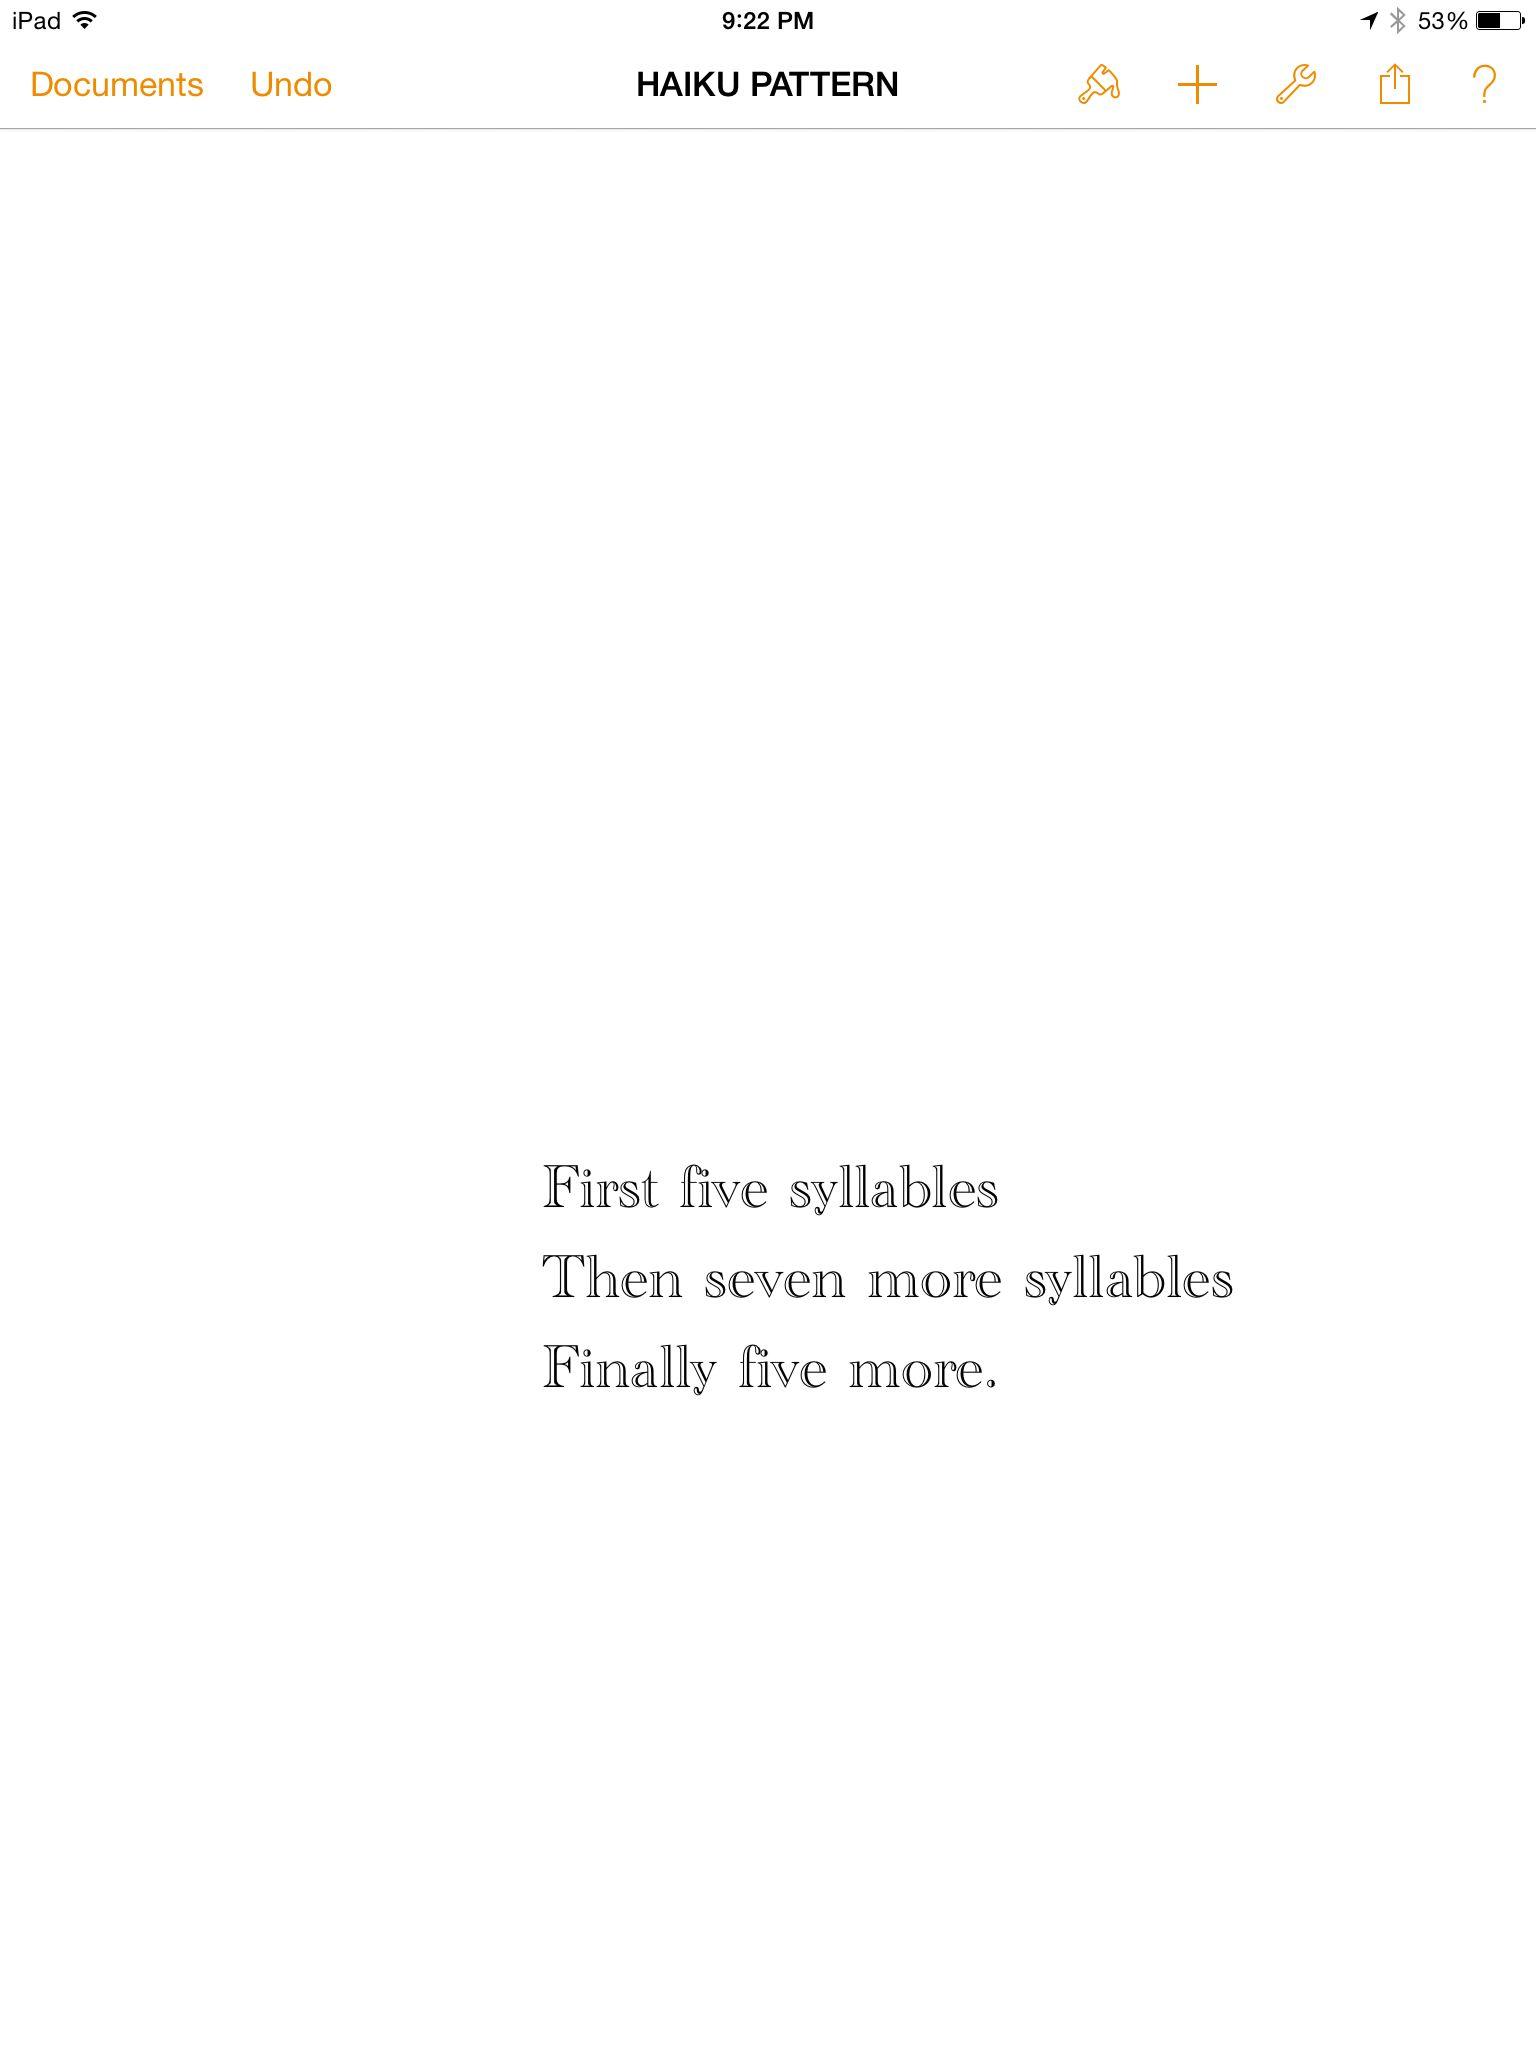 Haiku Pattern